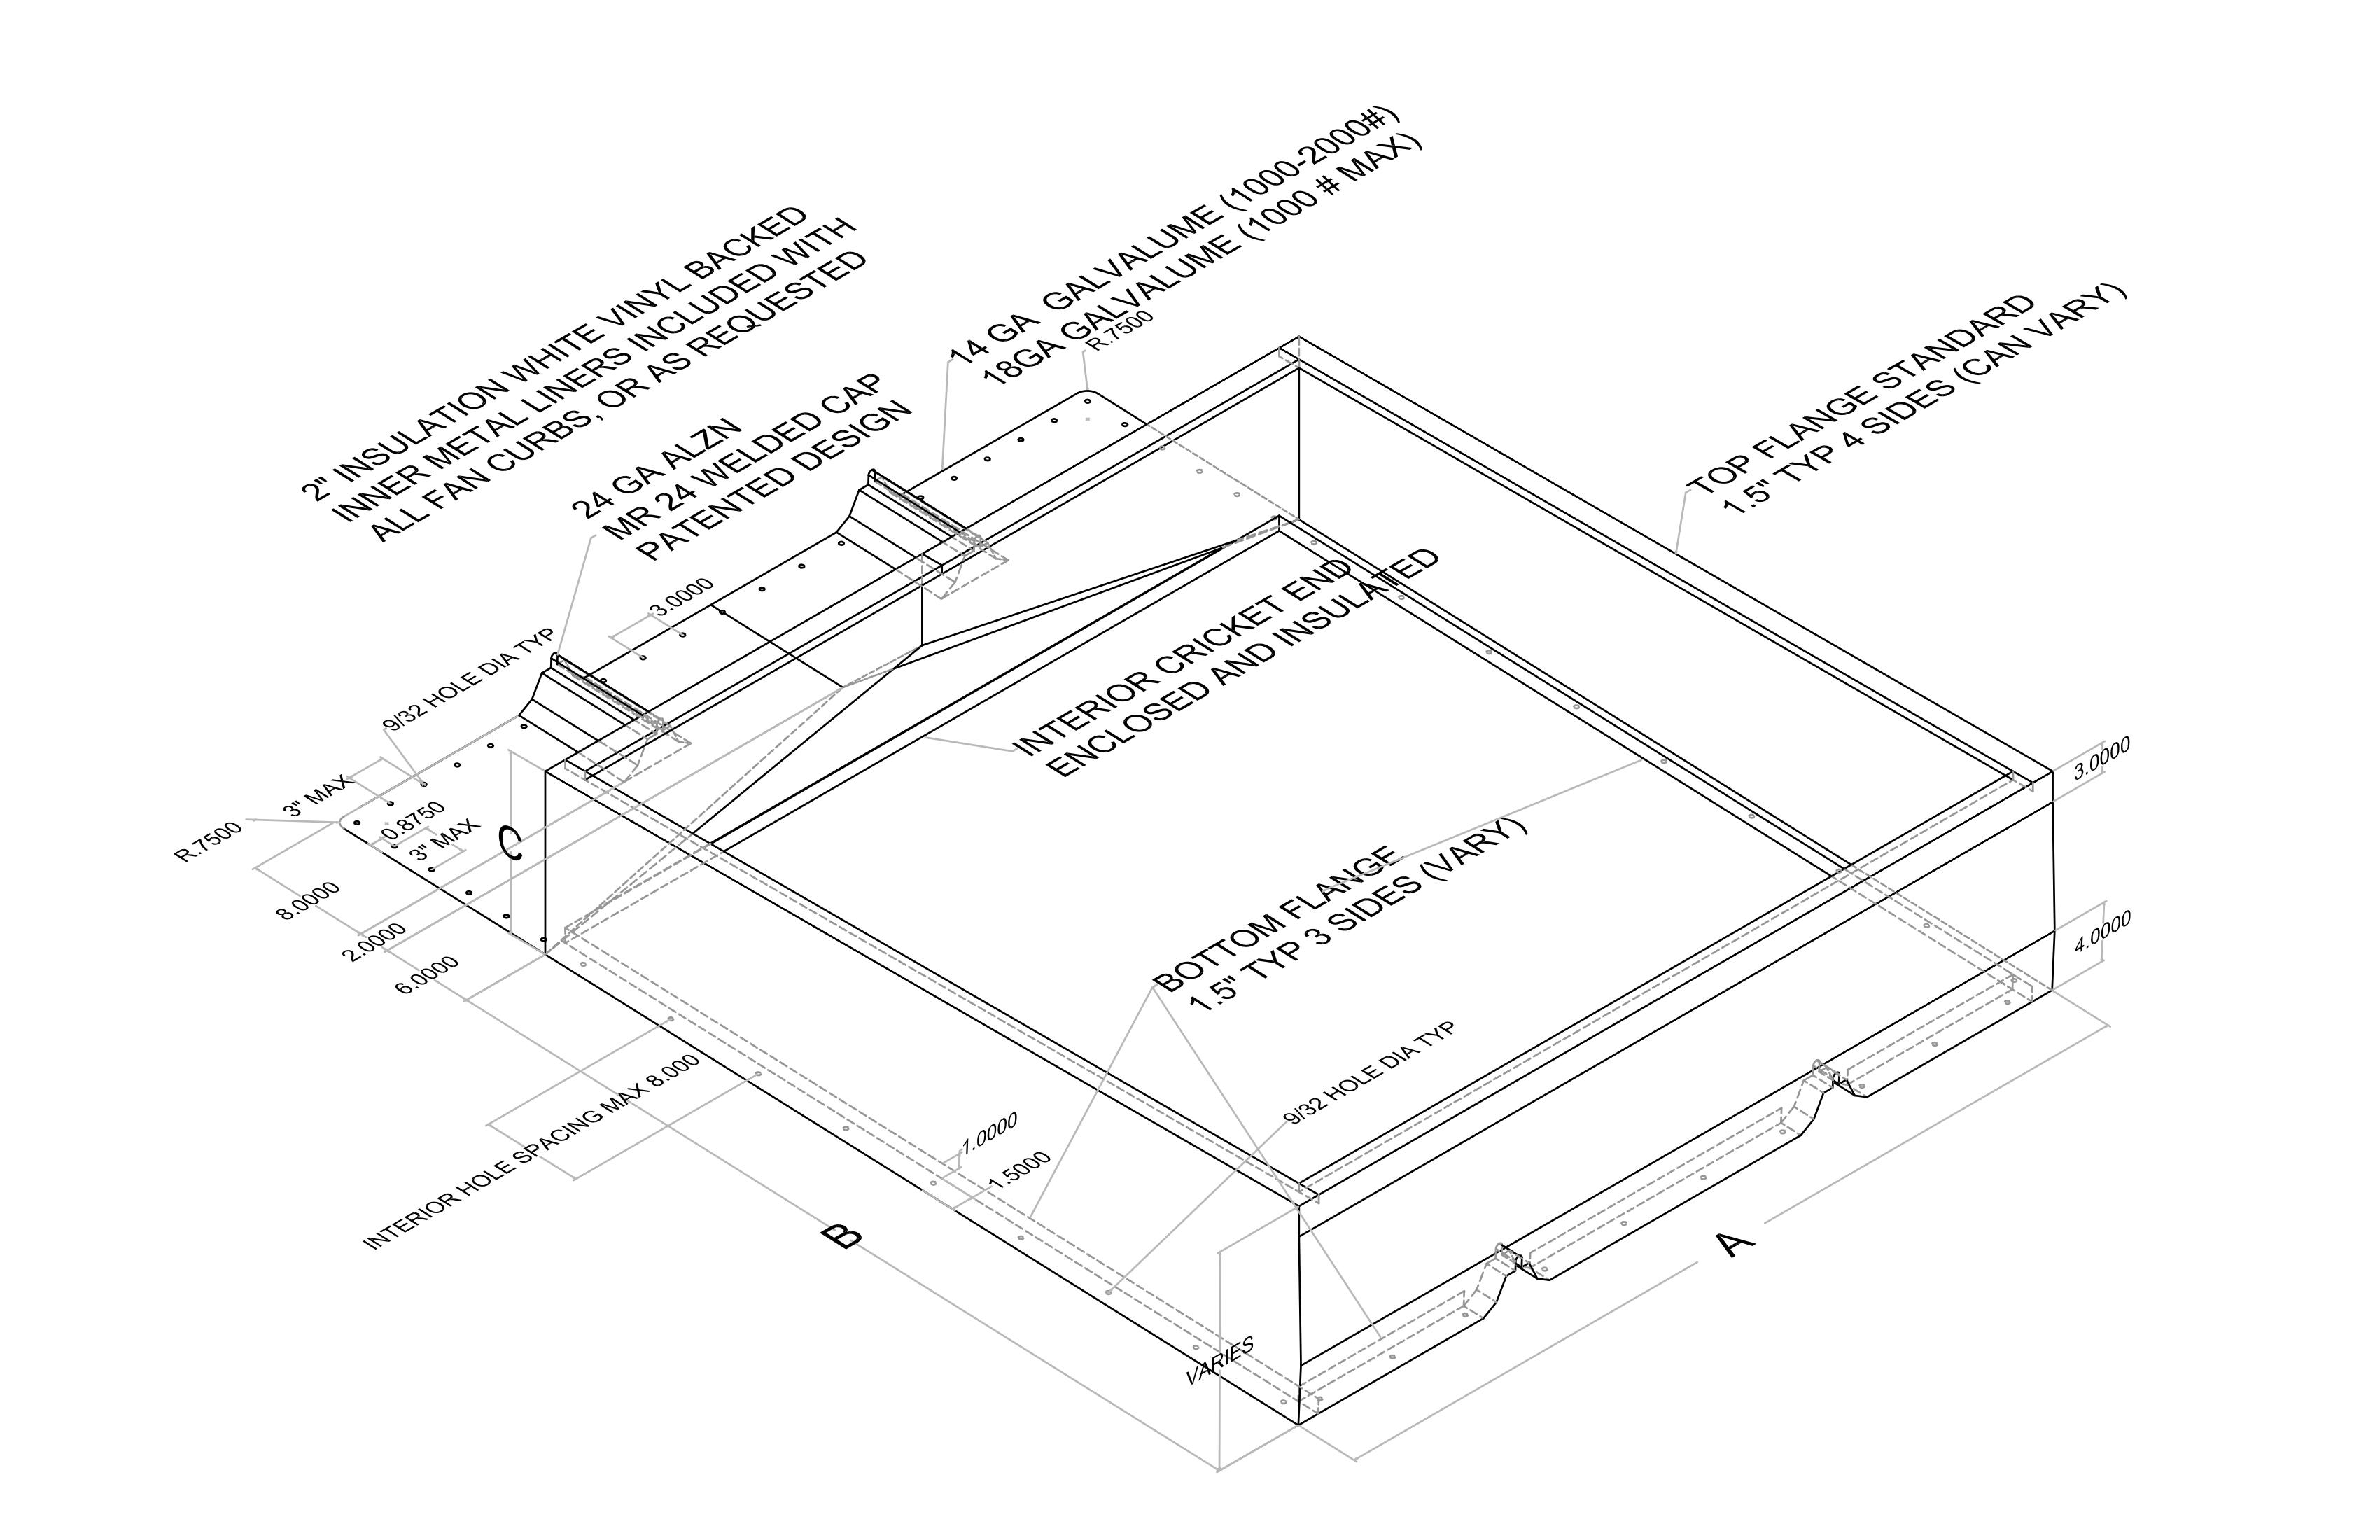 Curb Design Diagram Not Lossing Wiring Ssm Roof Curbs Standard Sheet Metal Rh Standardsheetmetal Com Coats Nc Kokomo In